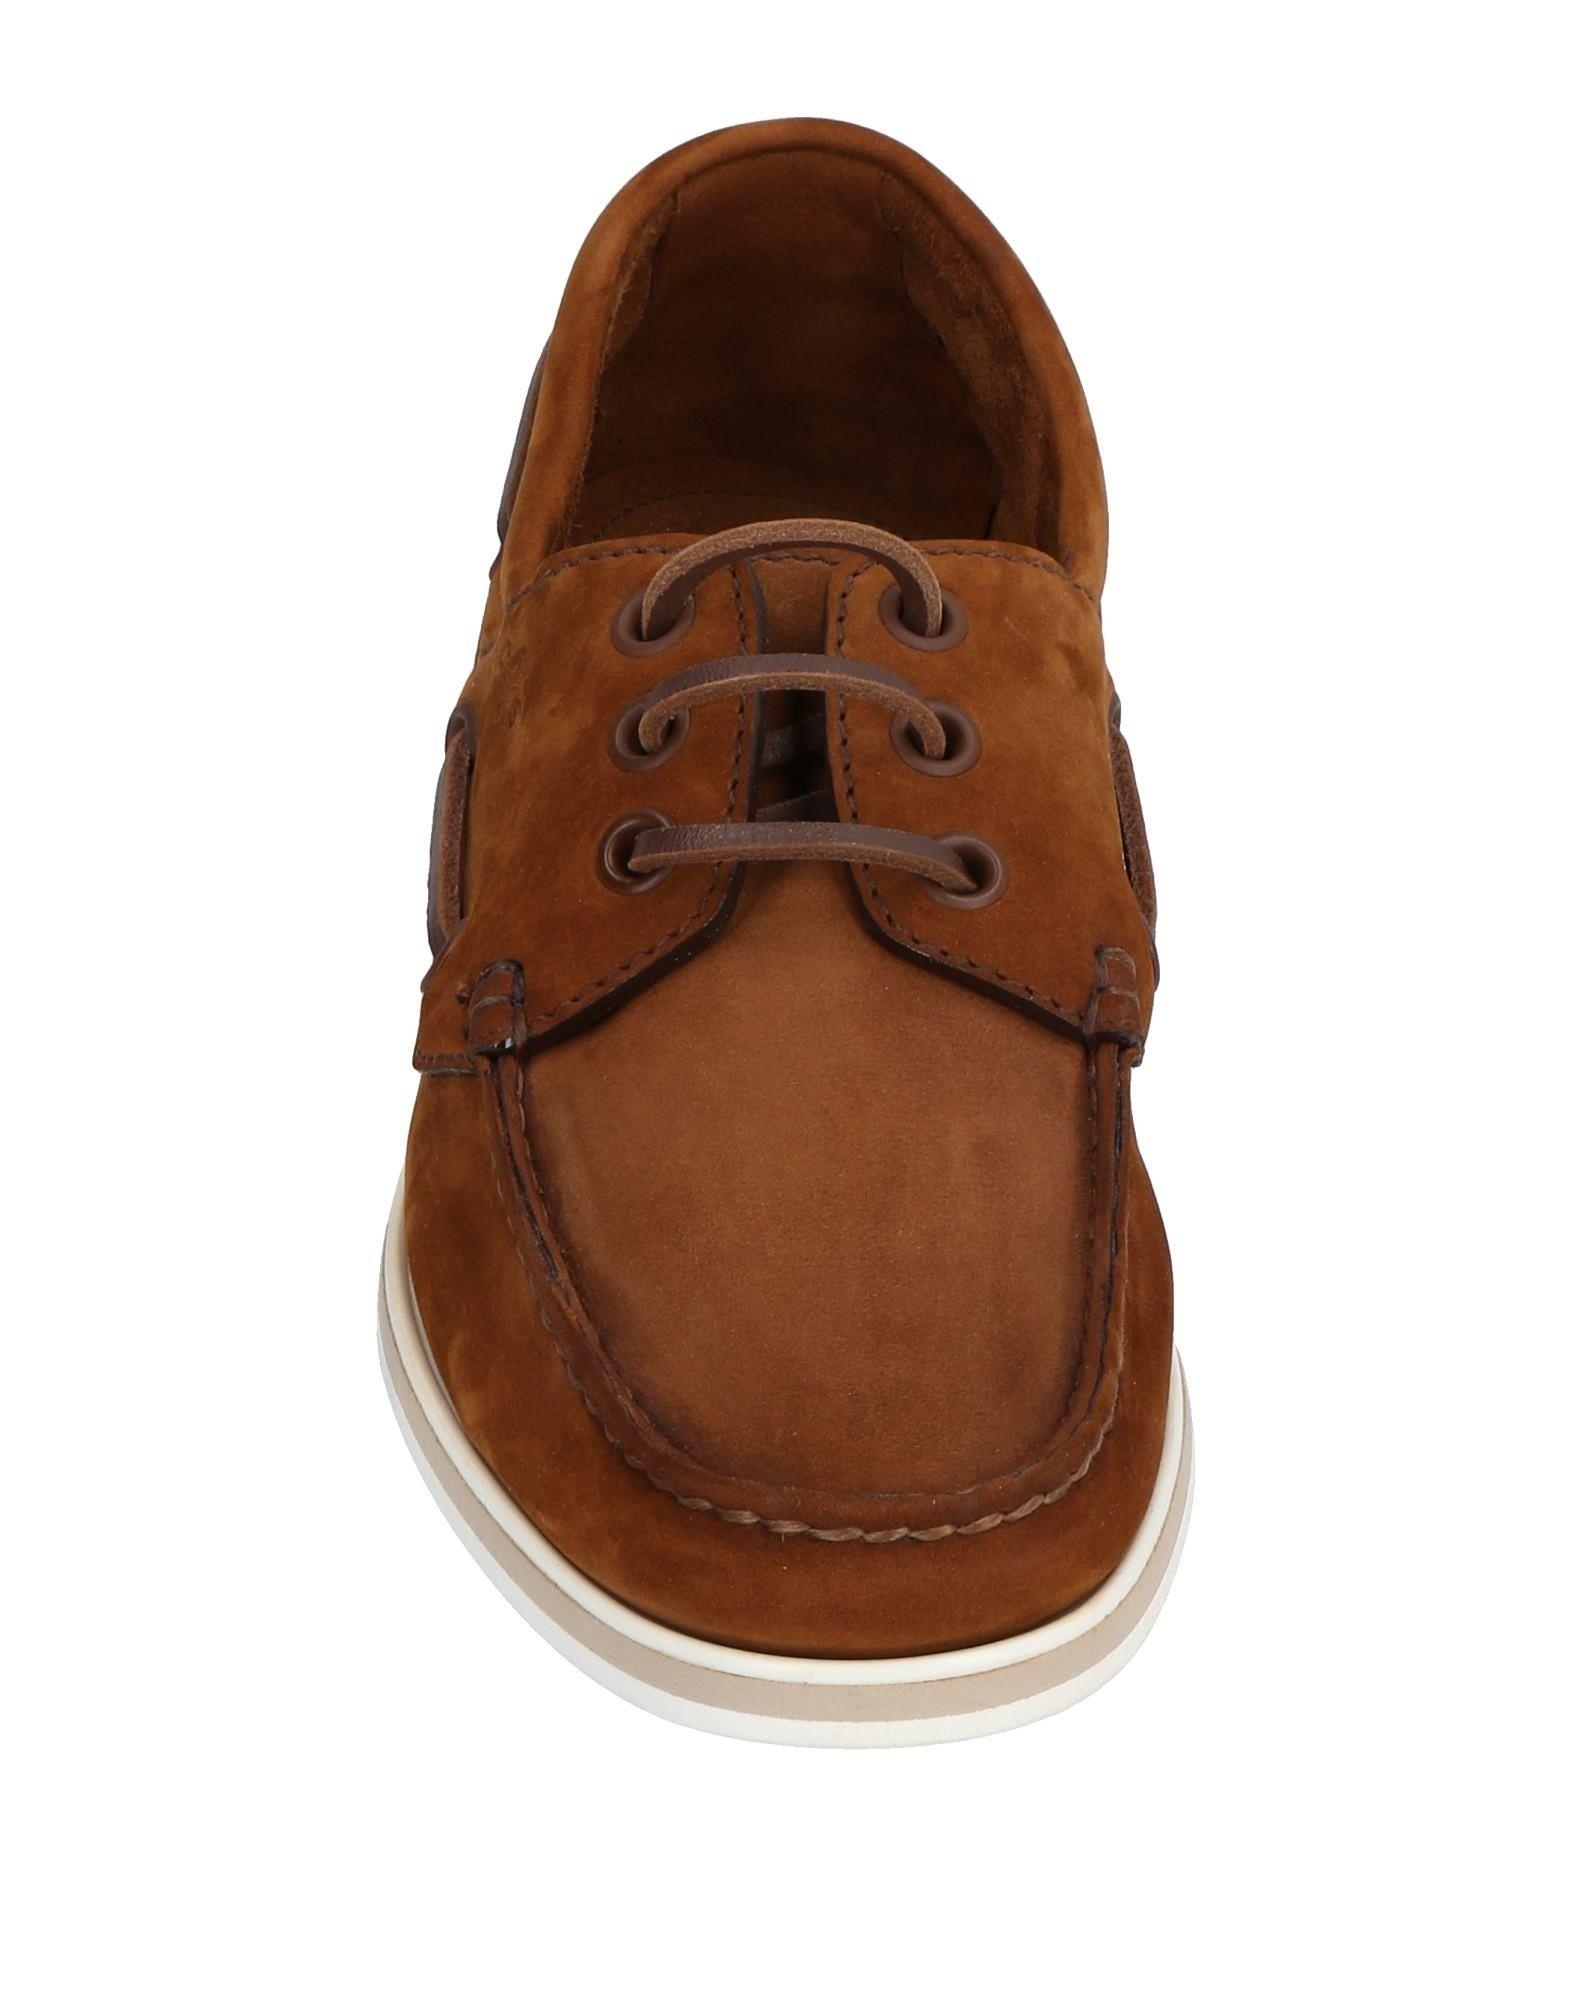 Carshoe Mokassins Herren  11505070LR Schuhe Gute Qualität beliebte Schuhe 11505070LR 05c268